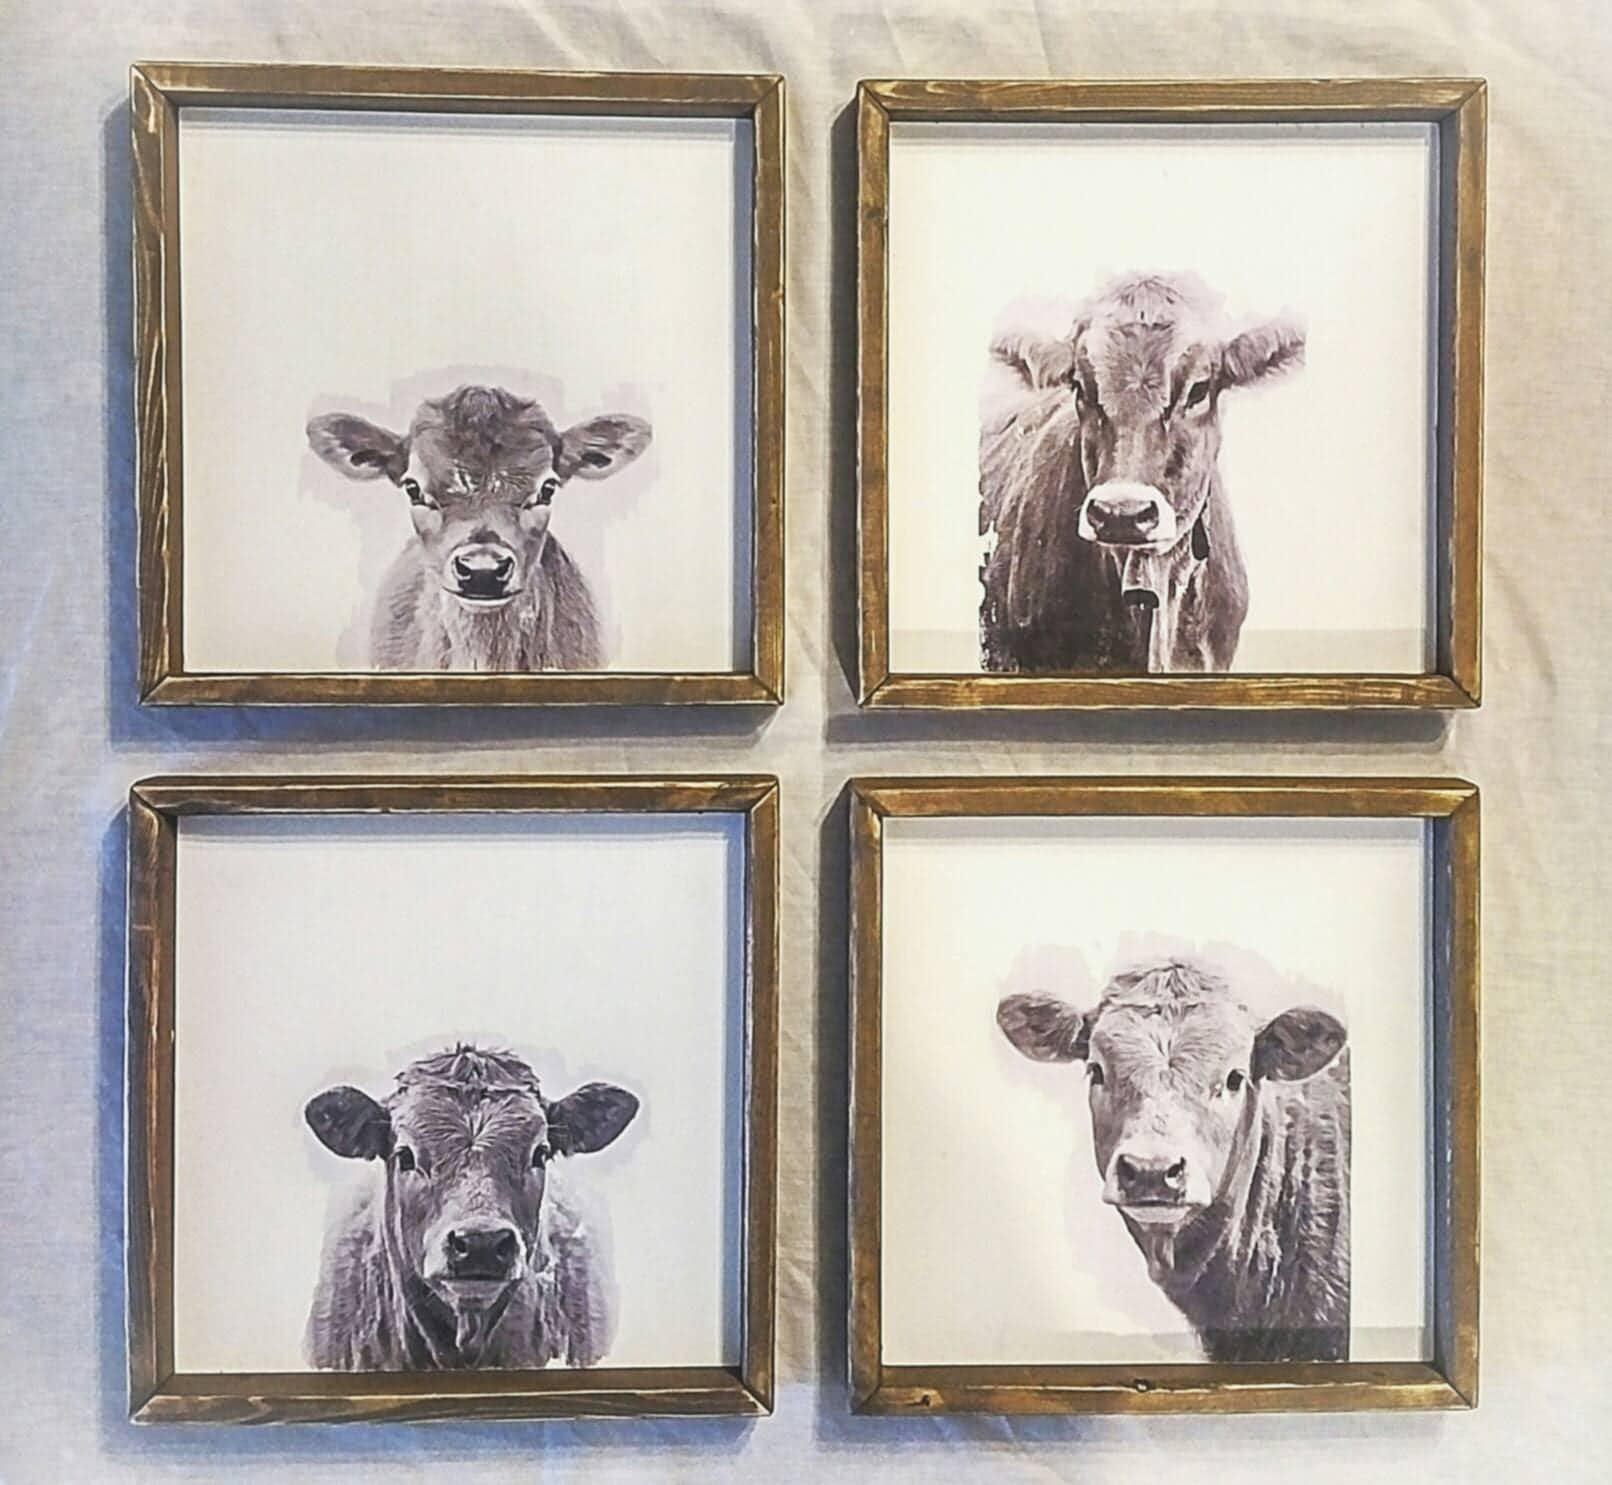 Cow Wall Decor. Cow Kitchen Decor. Cow Print. Farmhouse